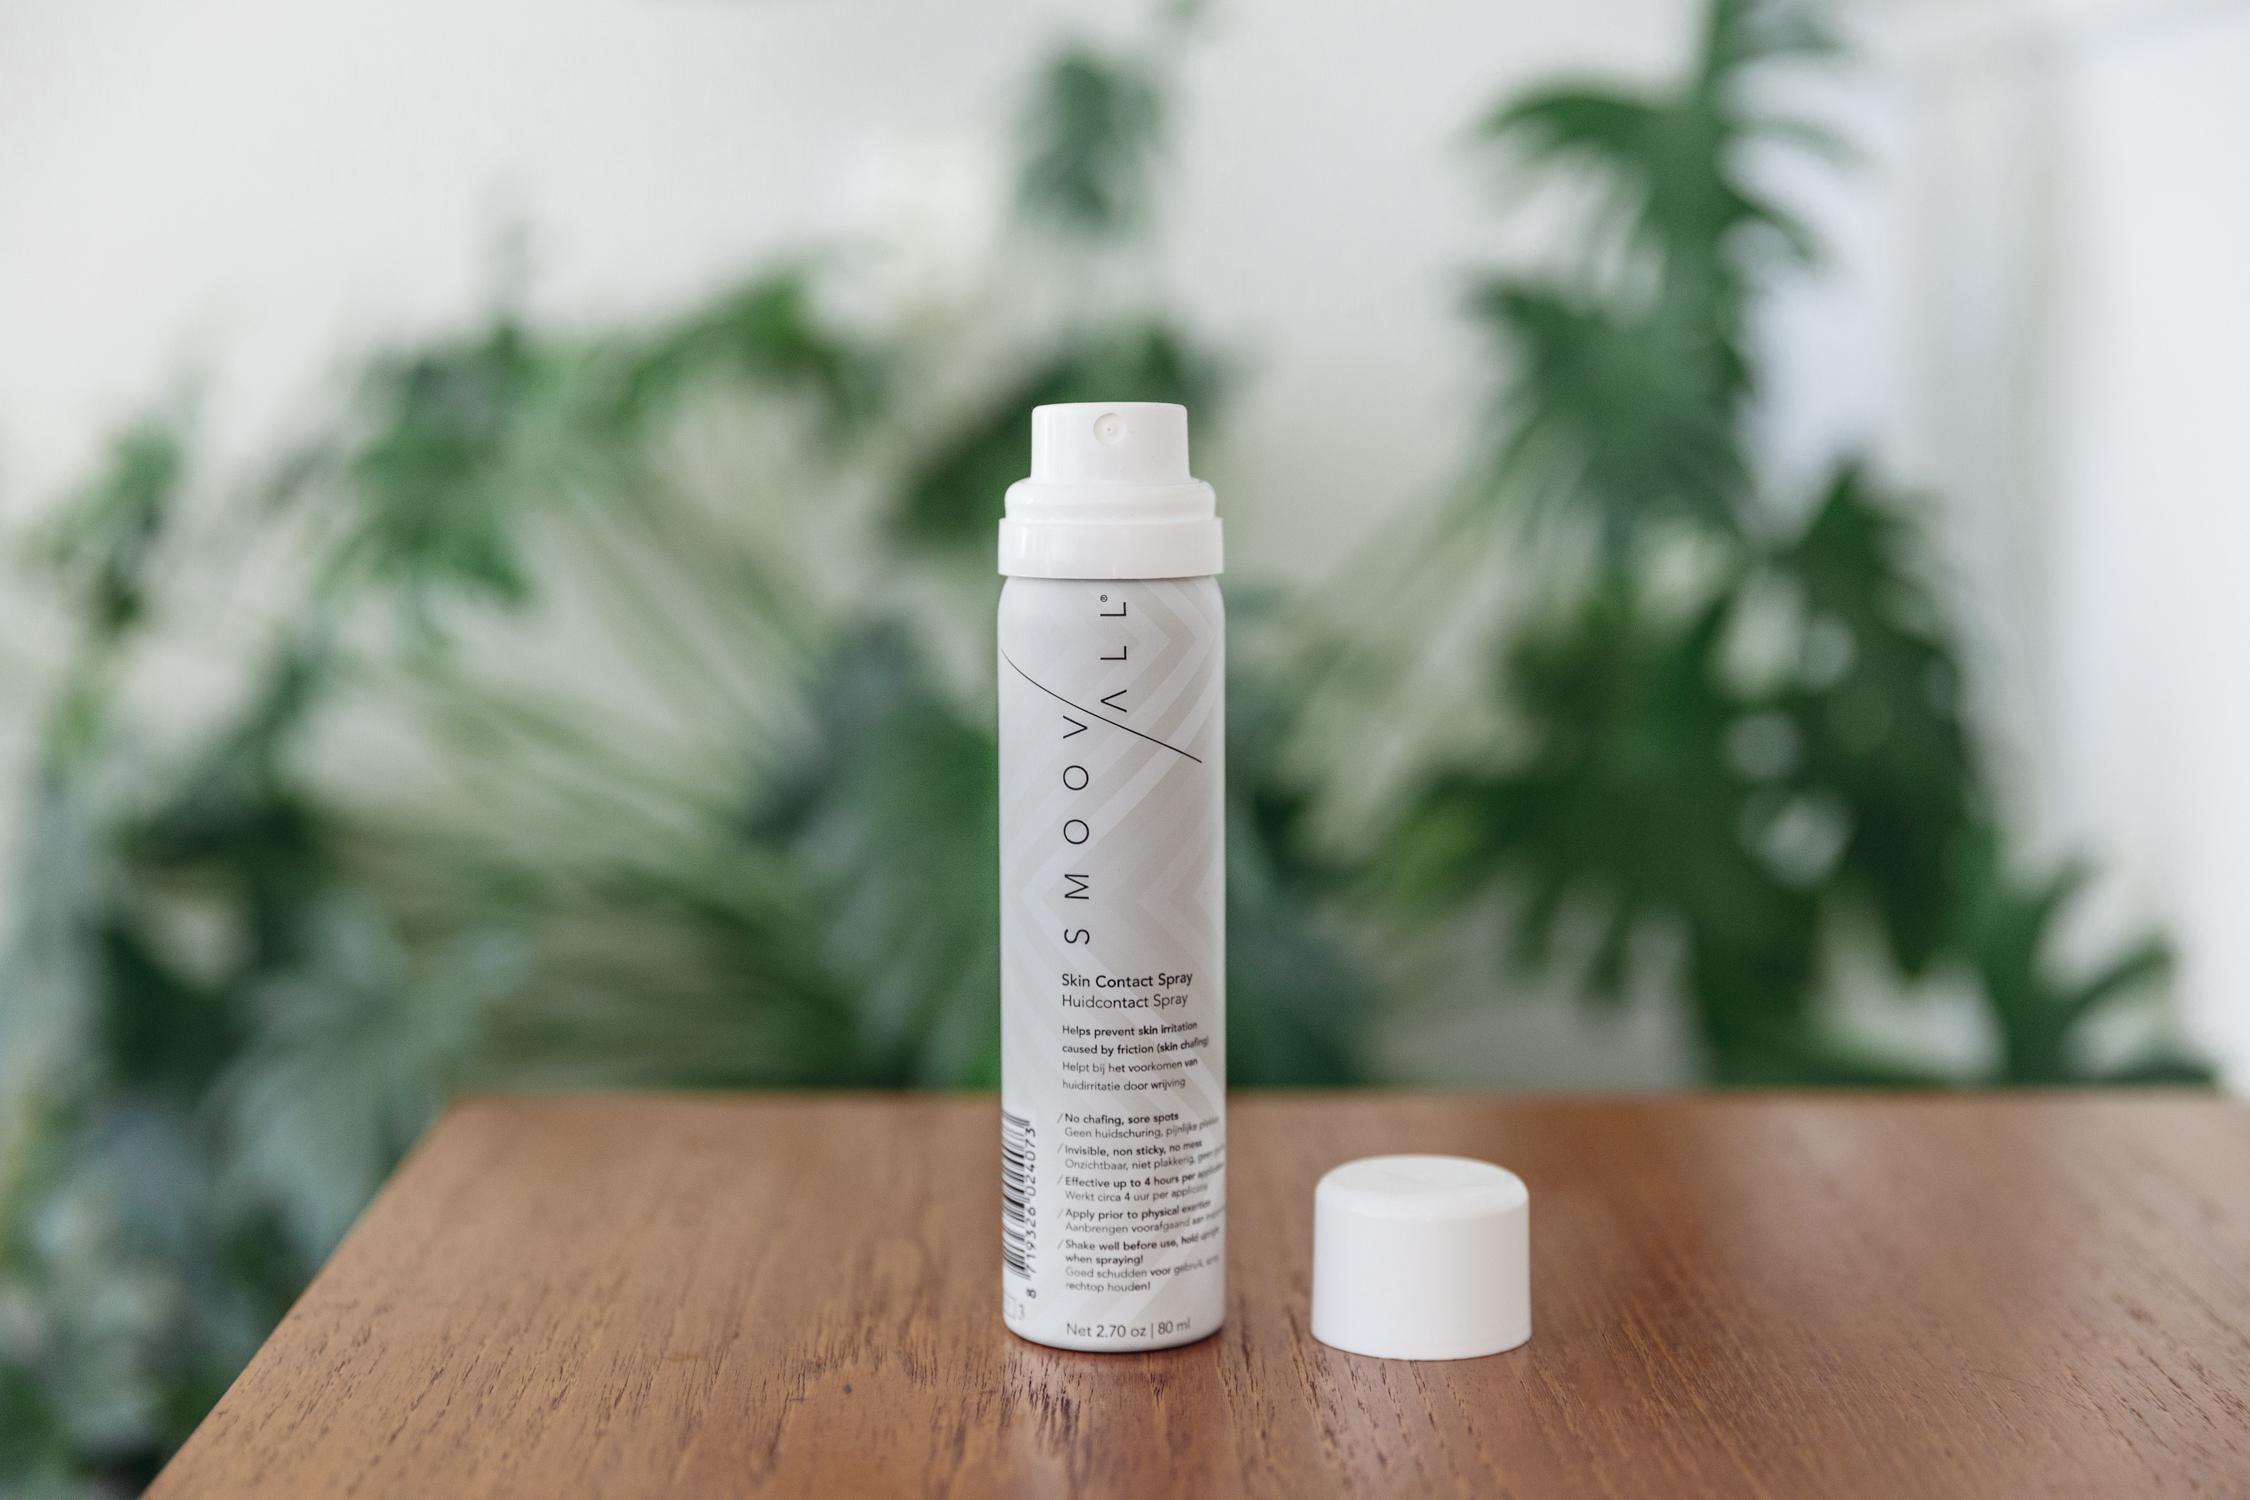 Hautkontaktspray Smoovall-1.jpg